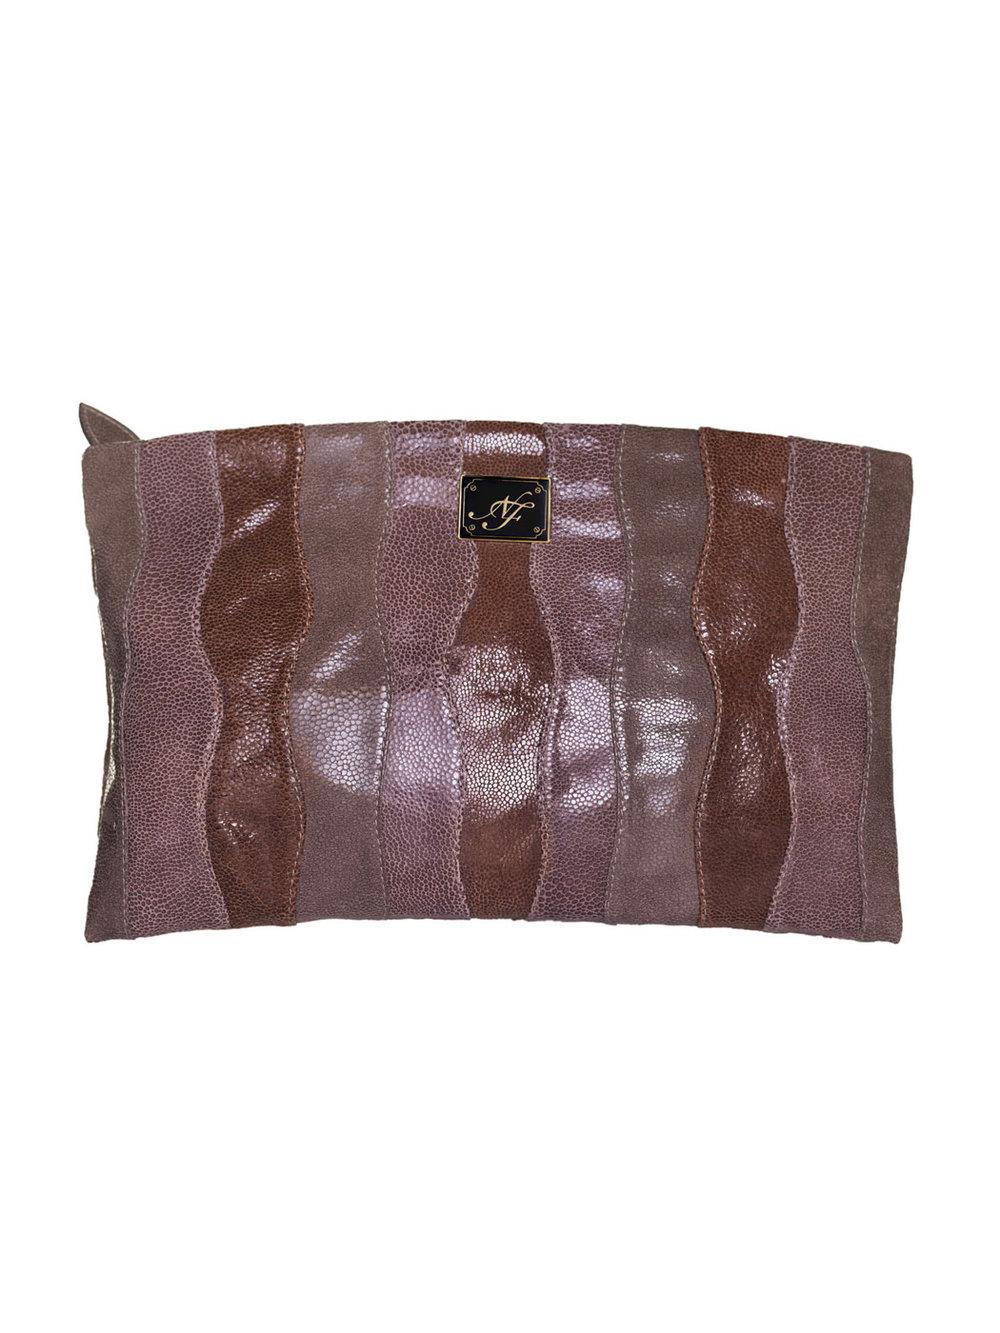 Clutch marrón - €210